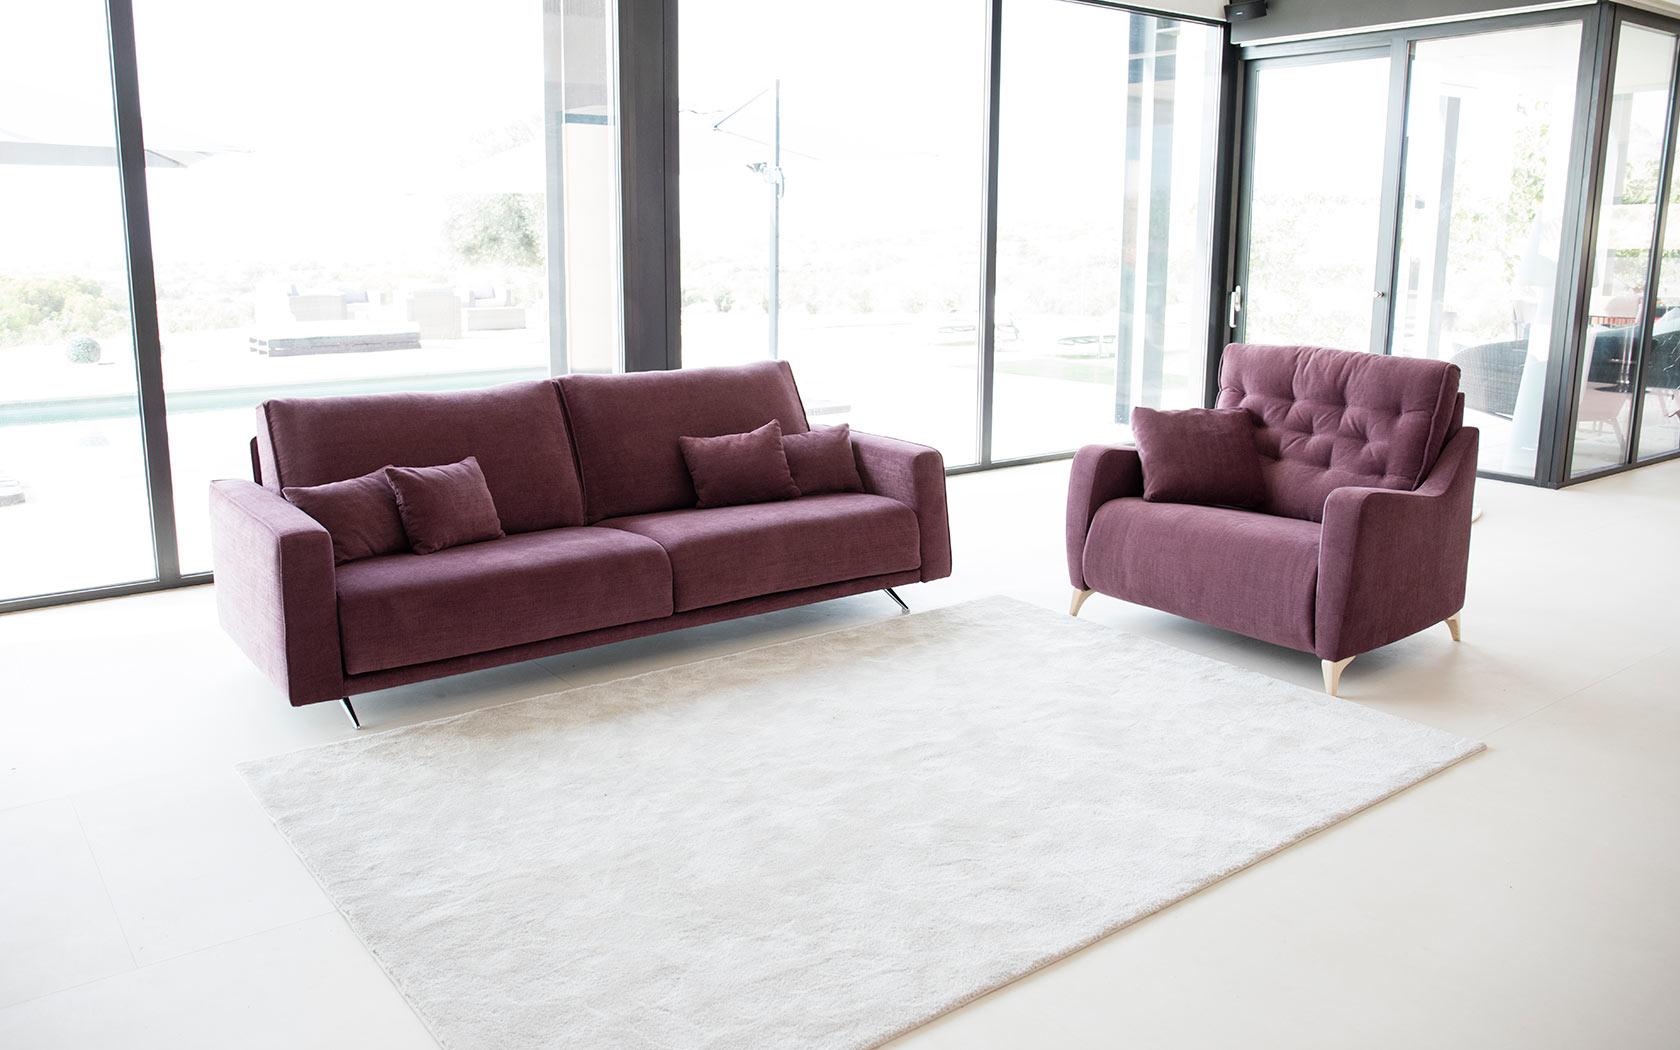 Boston sofa Fama 2019 02